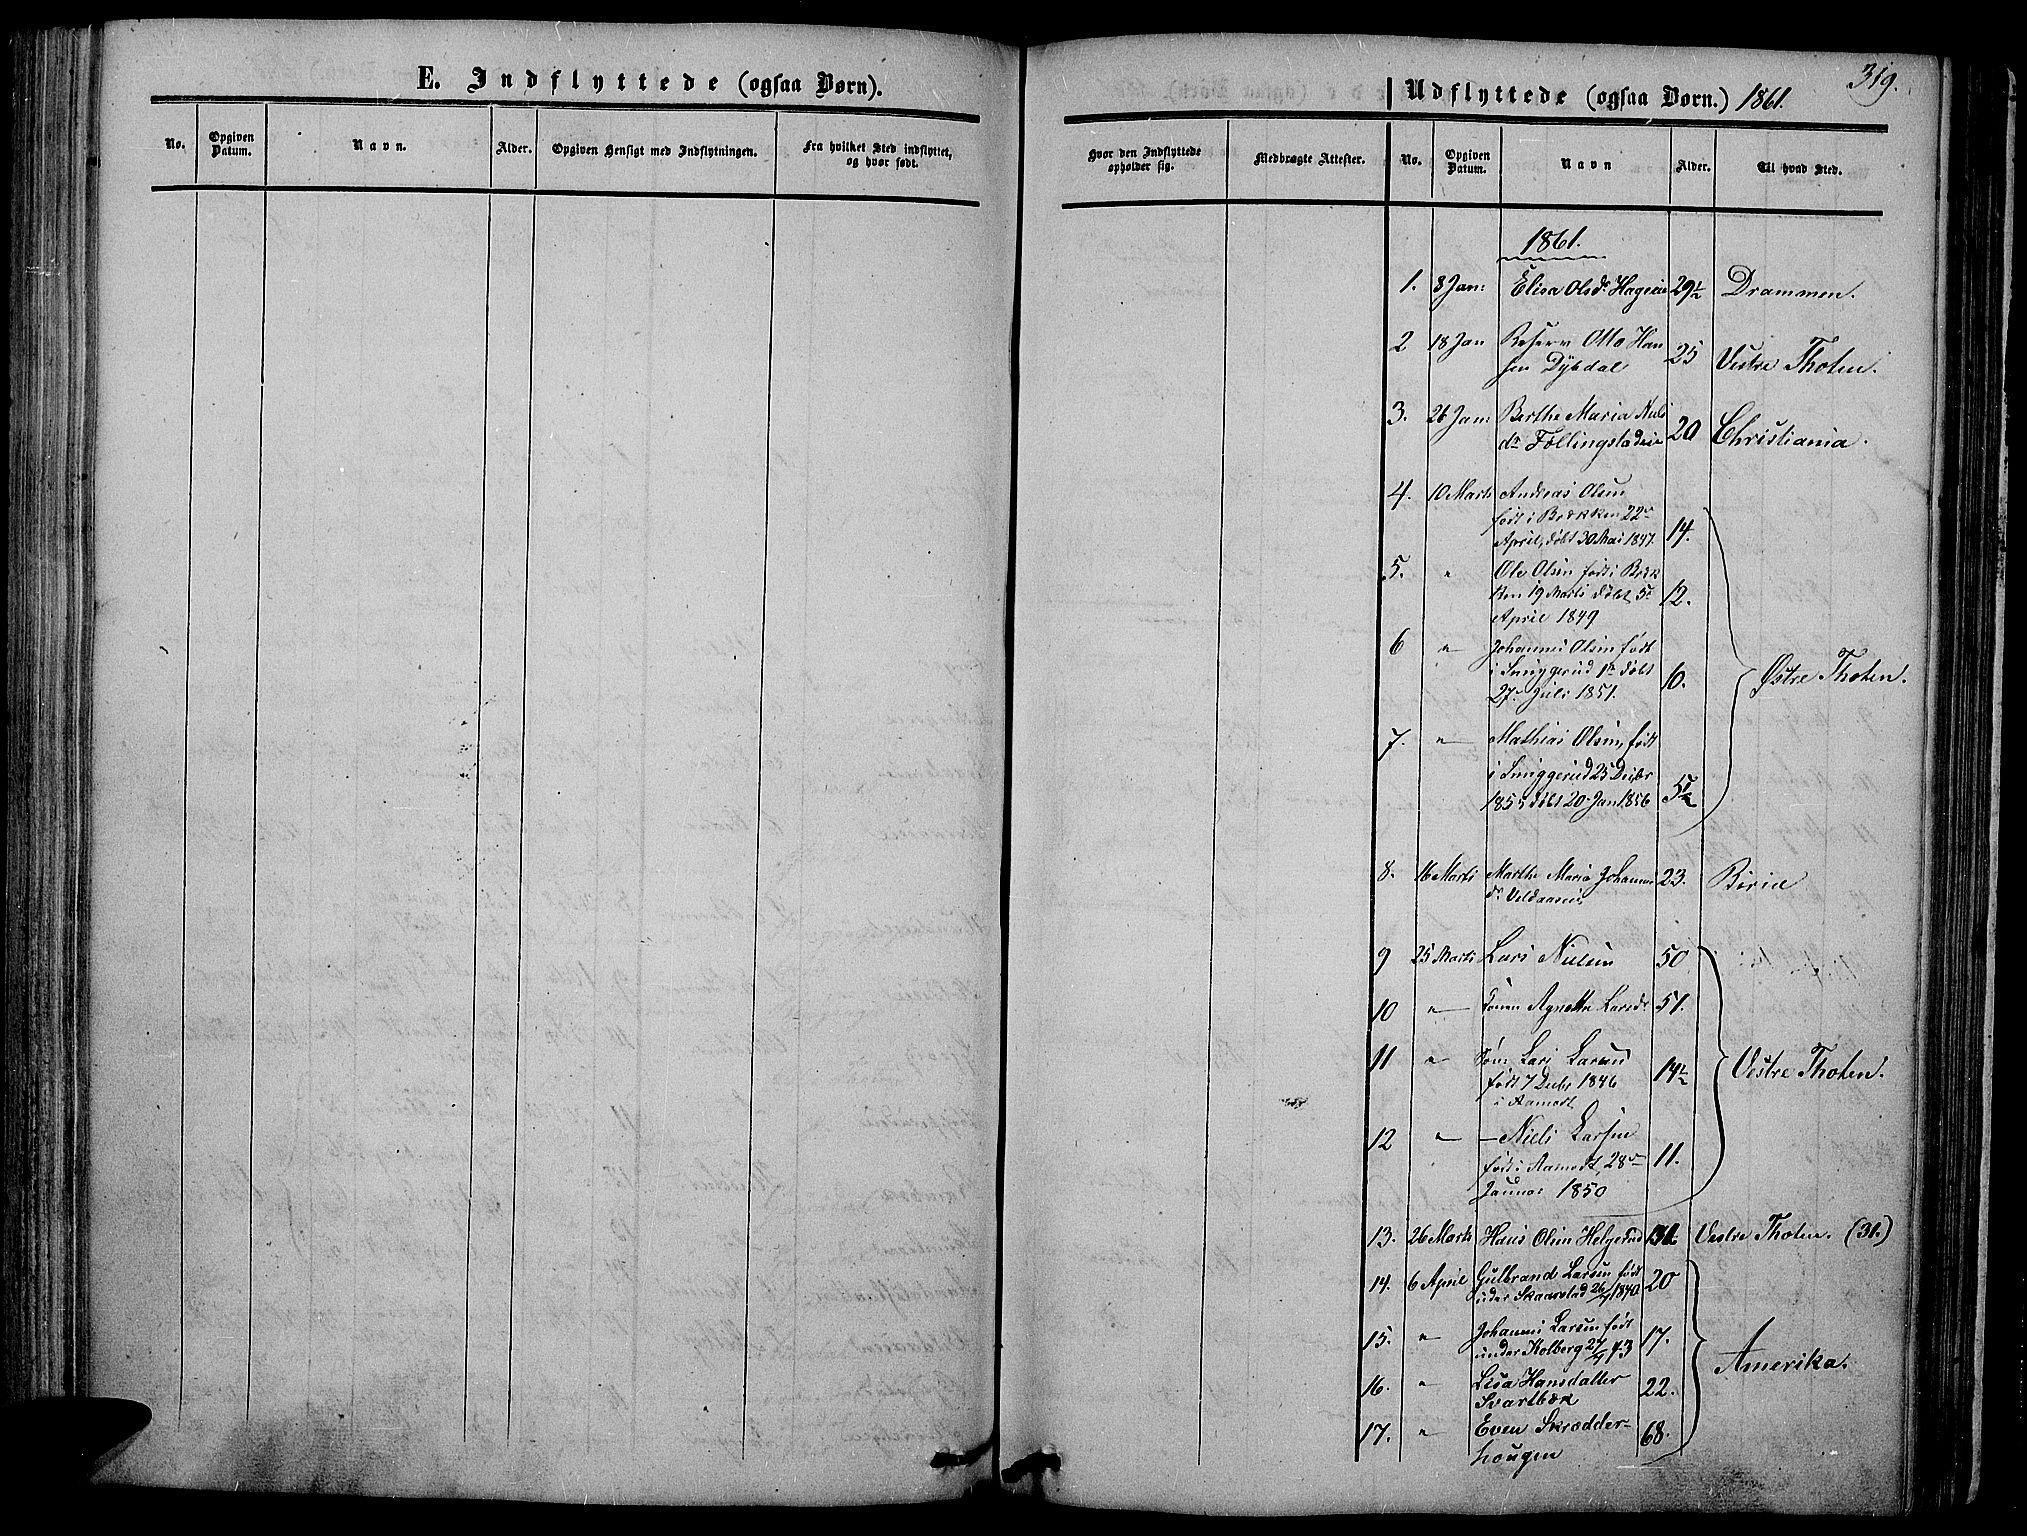 SAH, Vardal prestekontor, H/Ha/Hab/L0005: Klokkerbok nr. 5, 1854-1868, s. 319